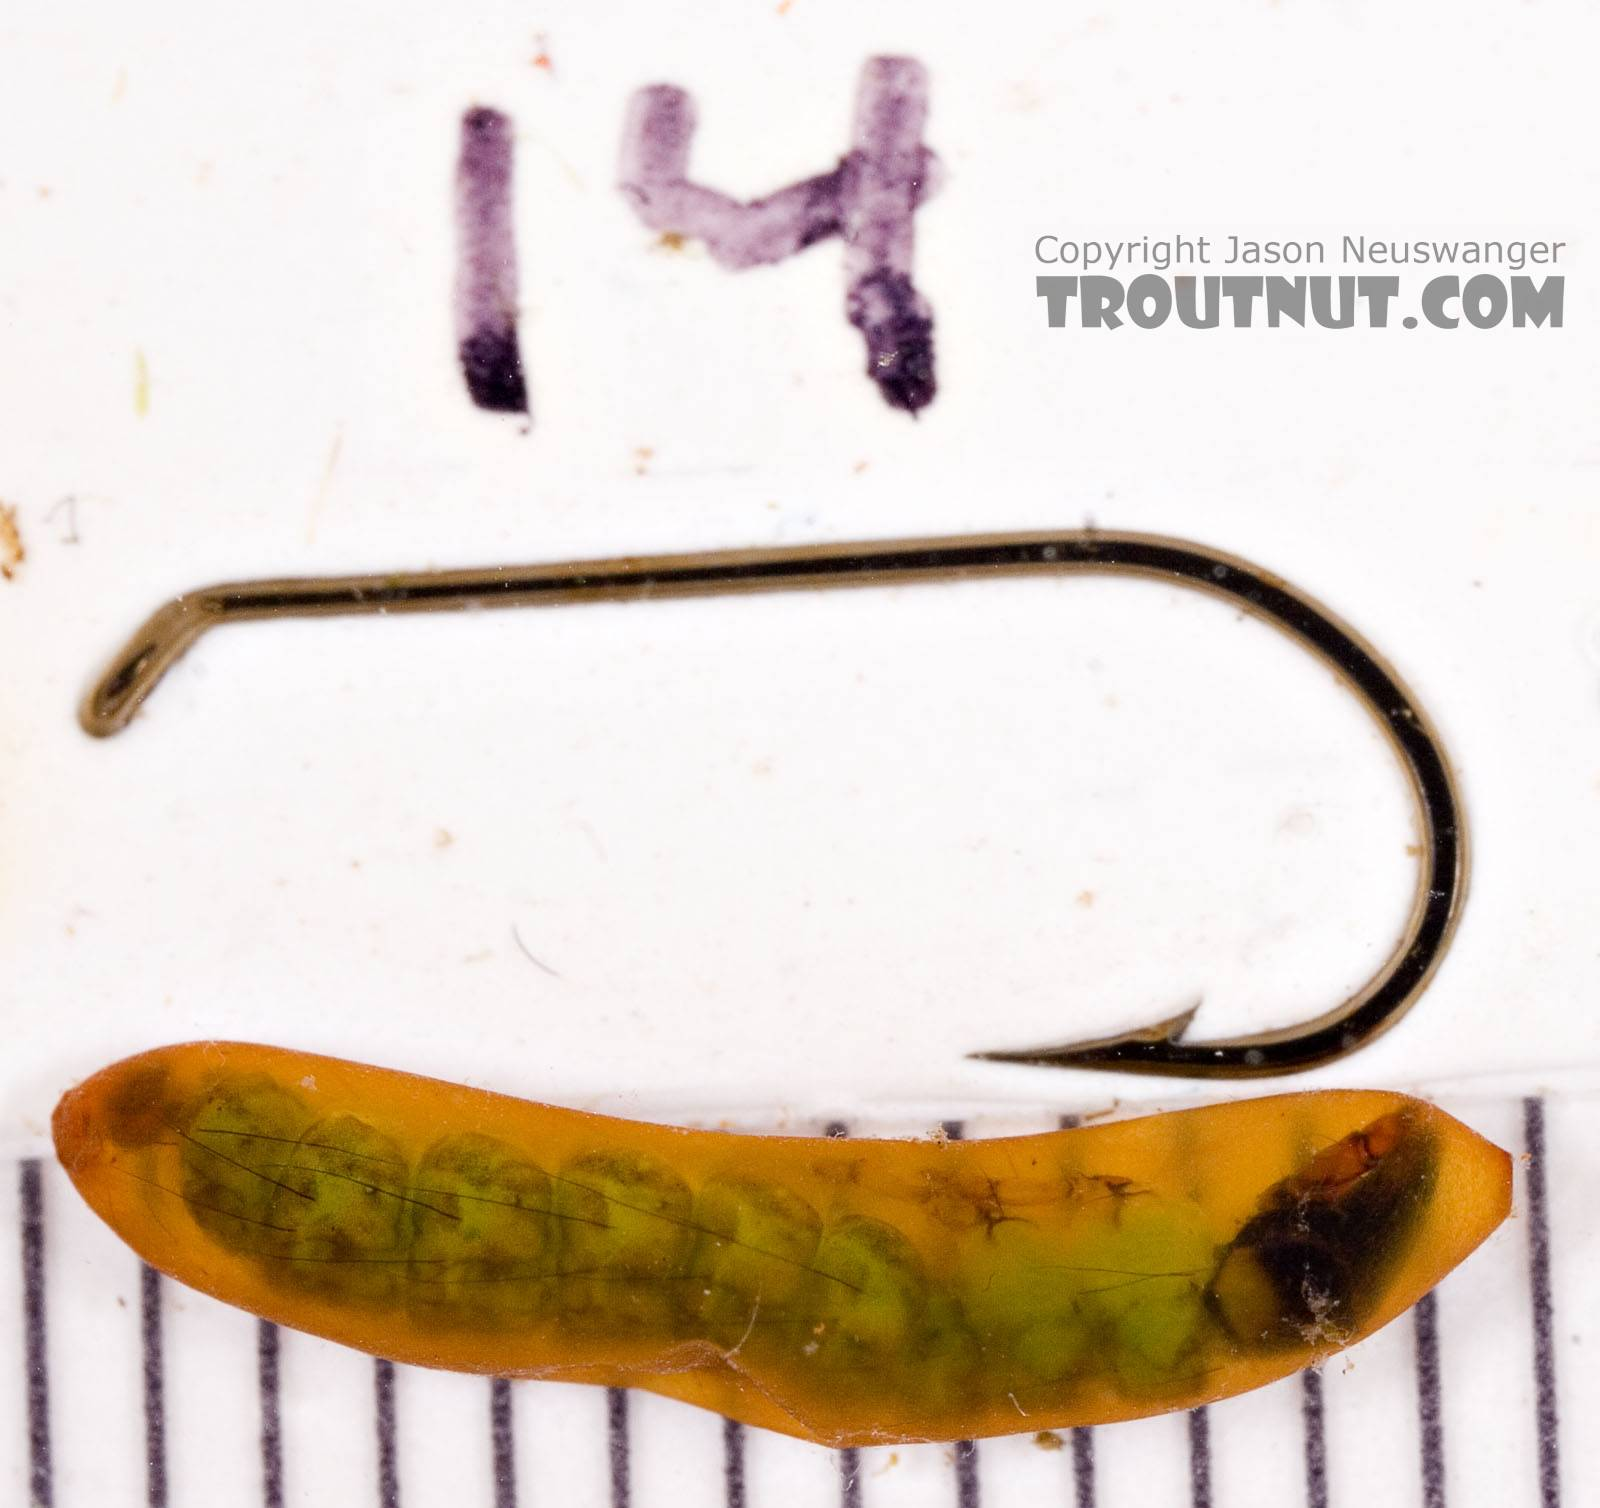 Rhyacophila (Green Sedges) Caddisfly Pupa from Mongaup Creek in New York